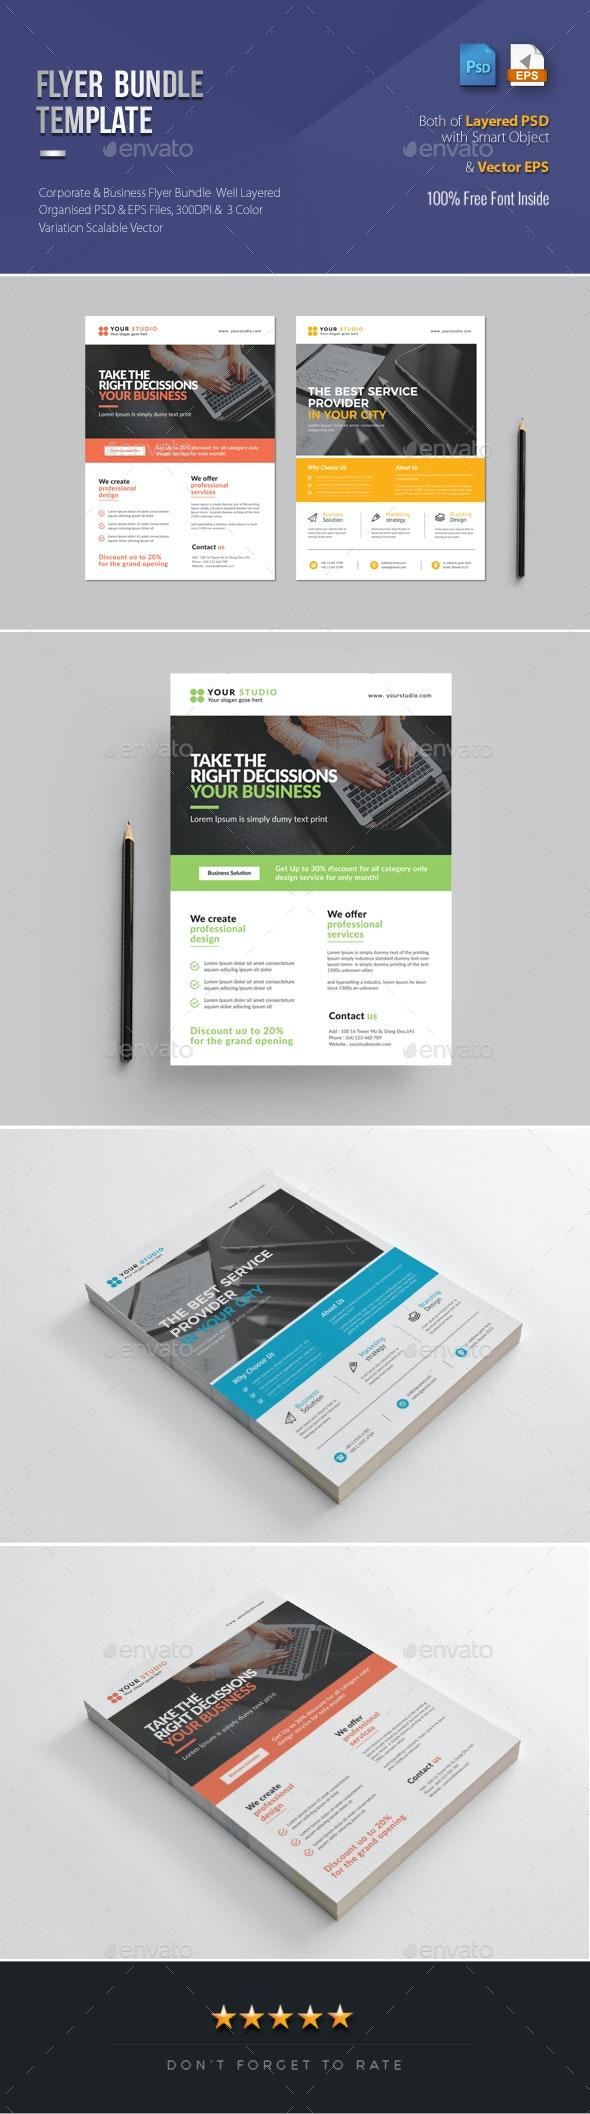 Business Flyer Bundle 2 in 1 - Corporate Flyers